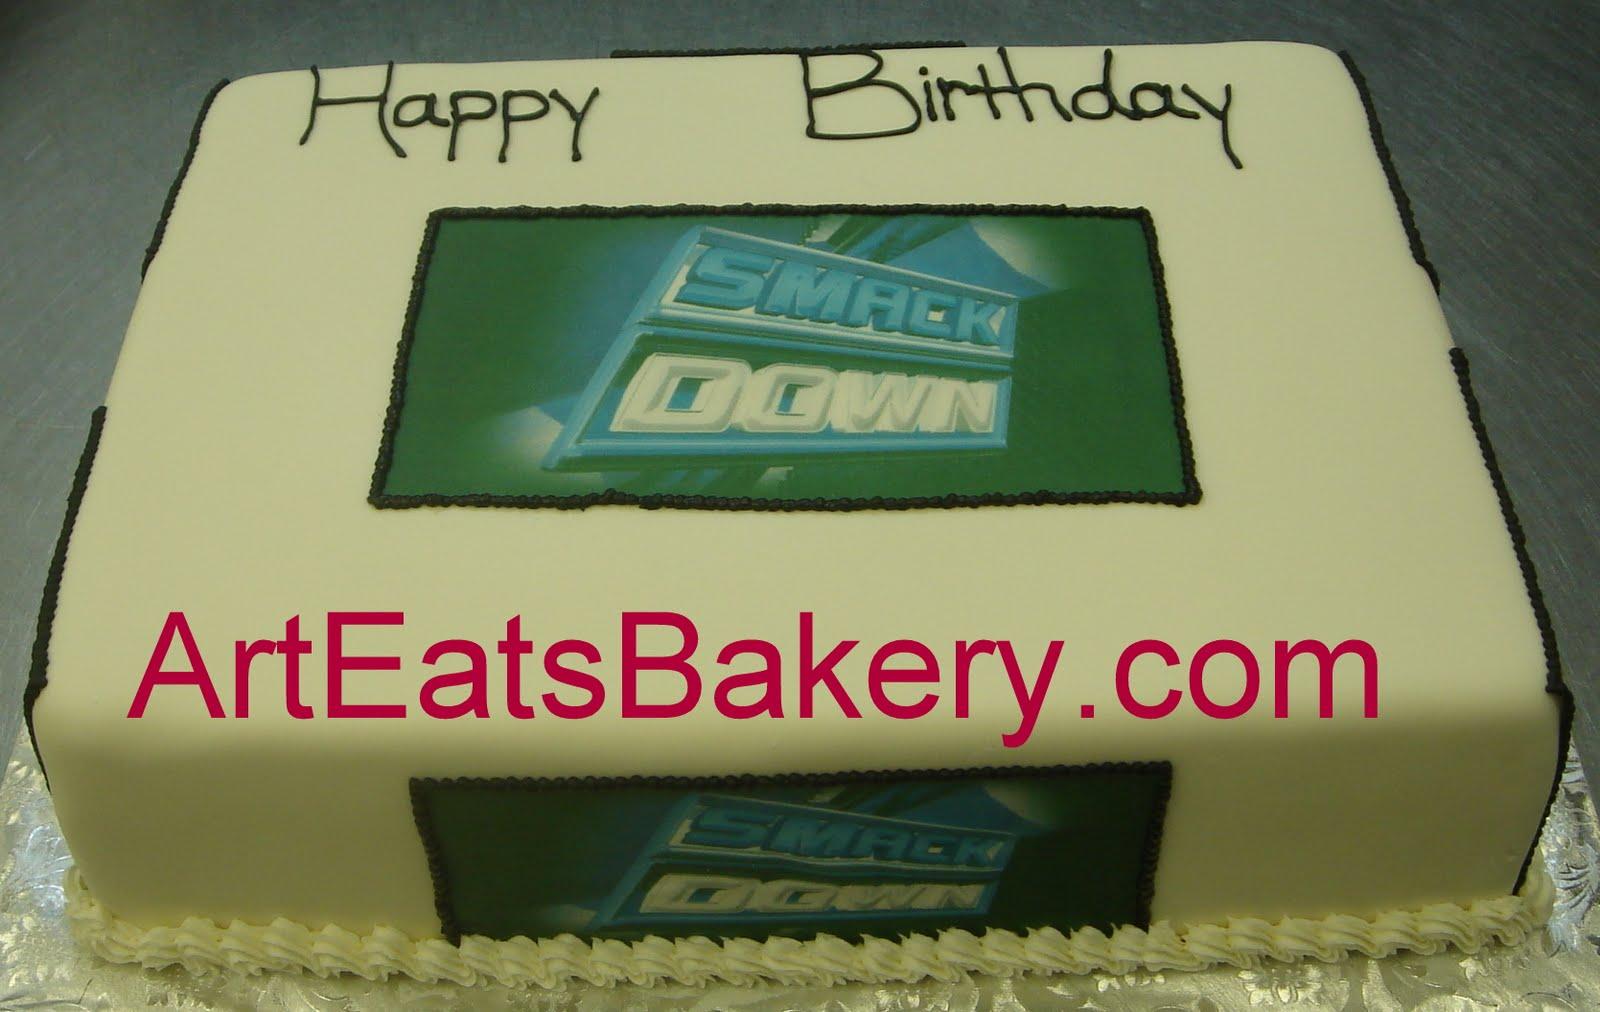 Miraculous 3D Pig Cake For The Wwe Wrestler Mickie James Arteatsbakery Funny Birthday Cards Online Necthendildamsfinfo